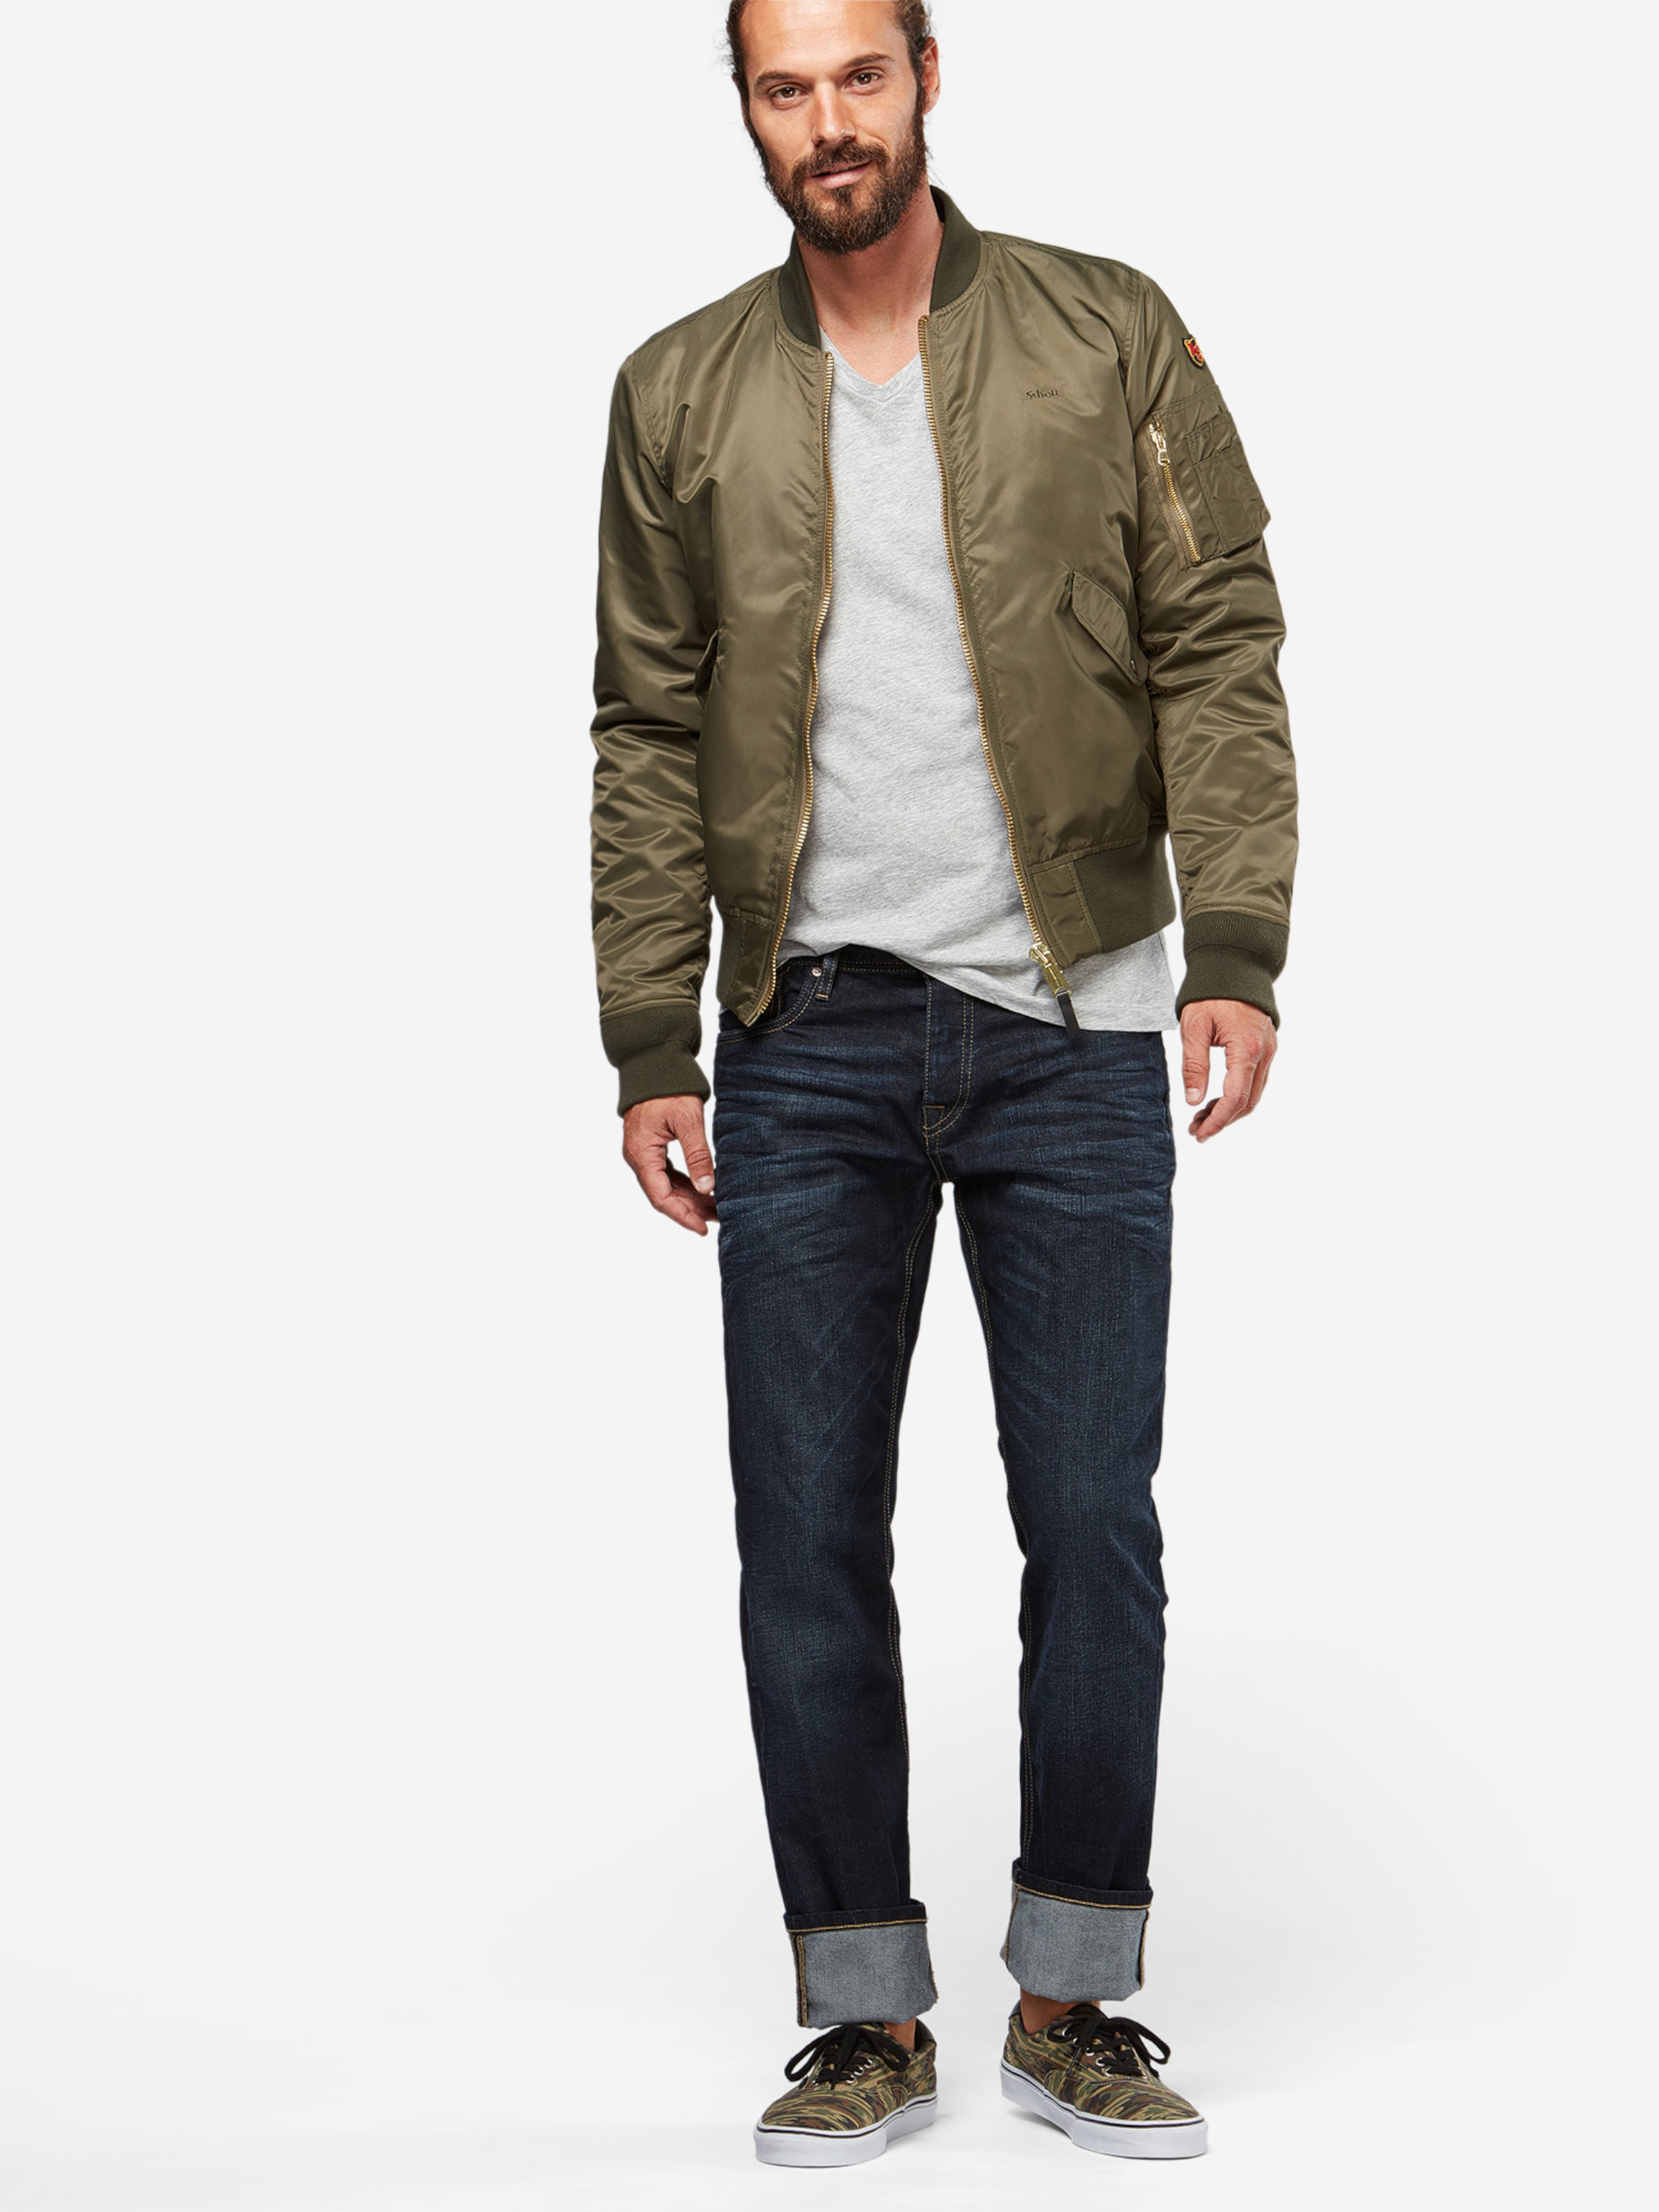 Marktfähig Günstiger Preis JACK & JONES Regular fit Jeans Clark Original JOS 318 Günstigster Preis Verkauf Neuer OQmi7iOfIf